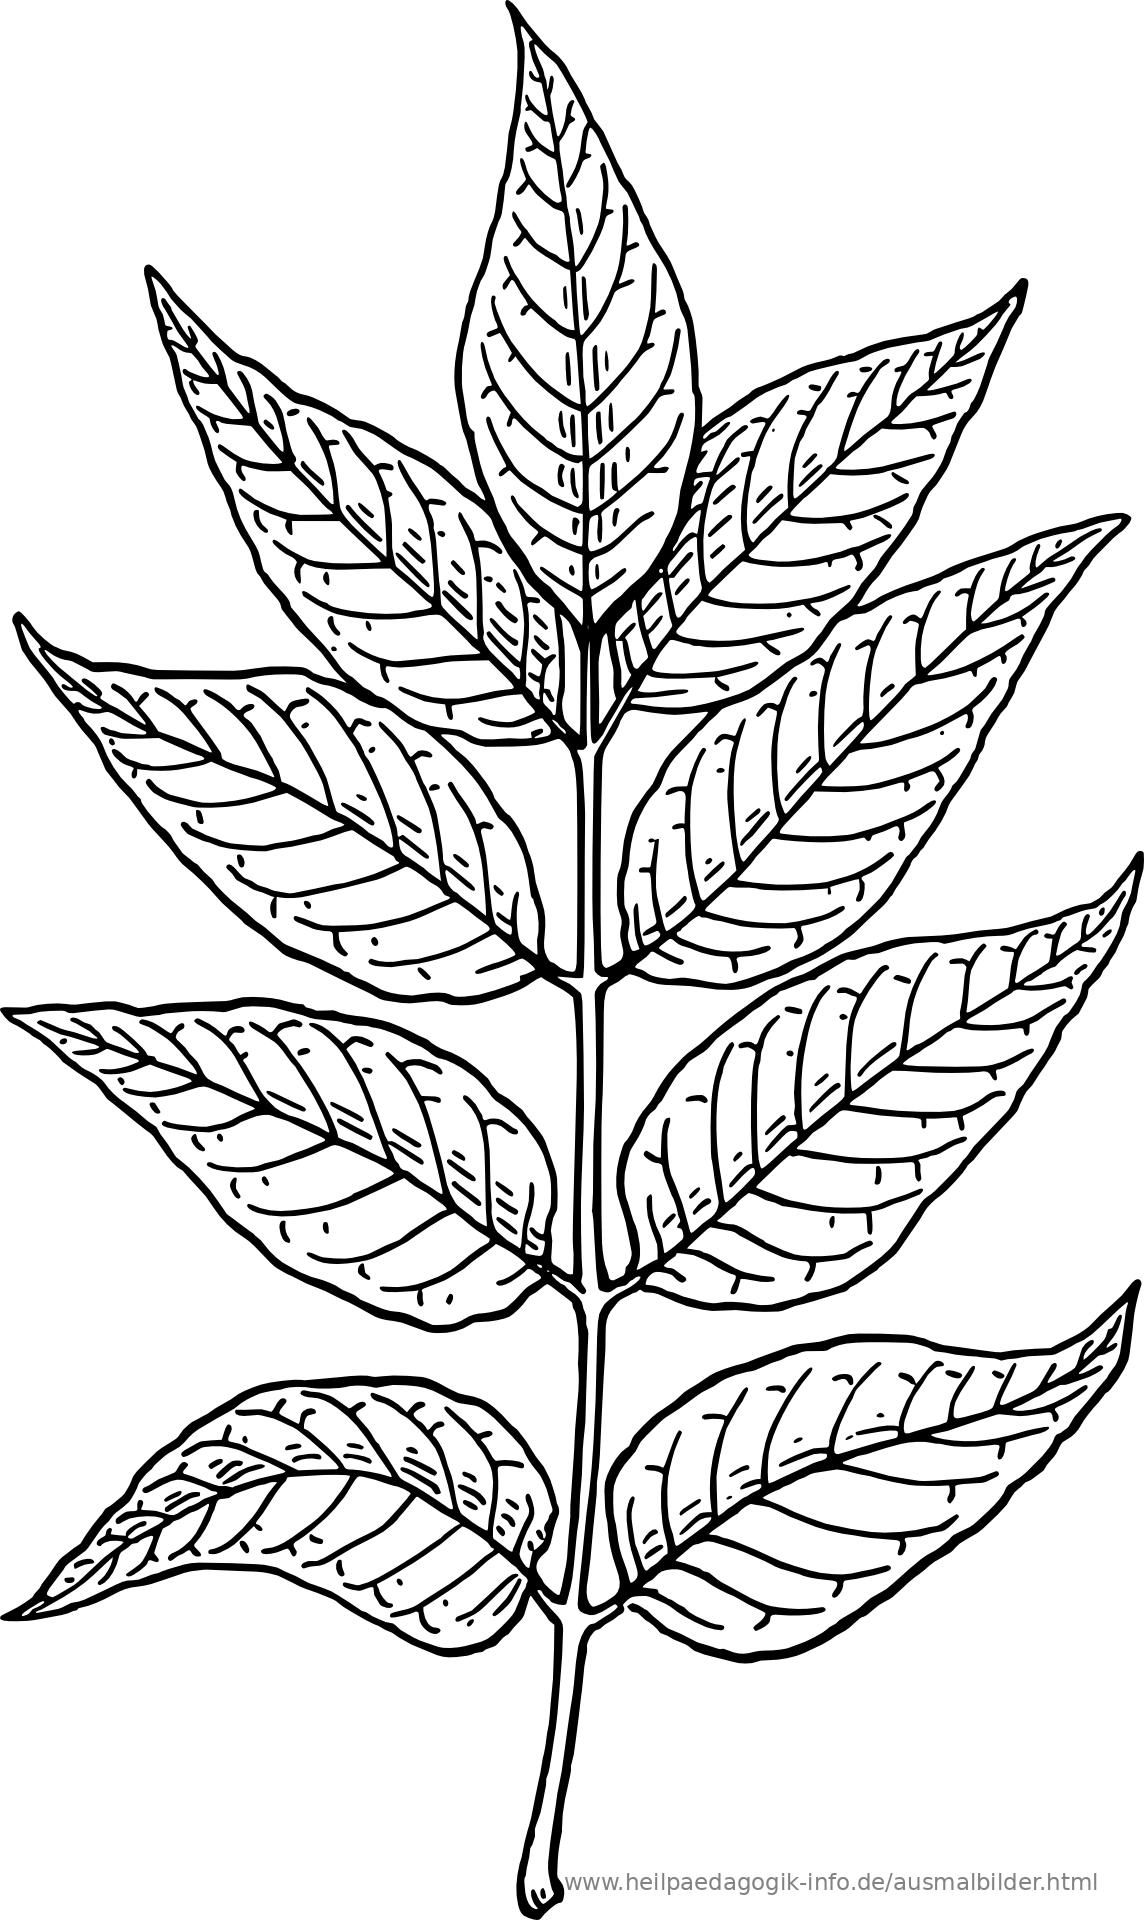 Ausmalbilder Blumen, Bäume, Blätter